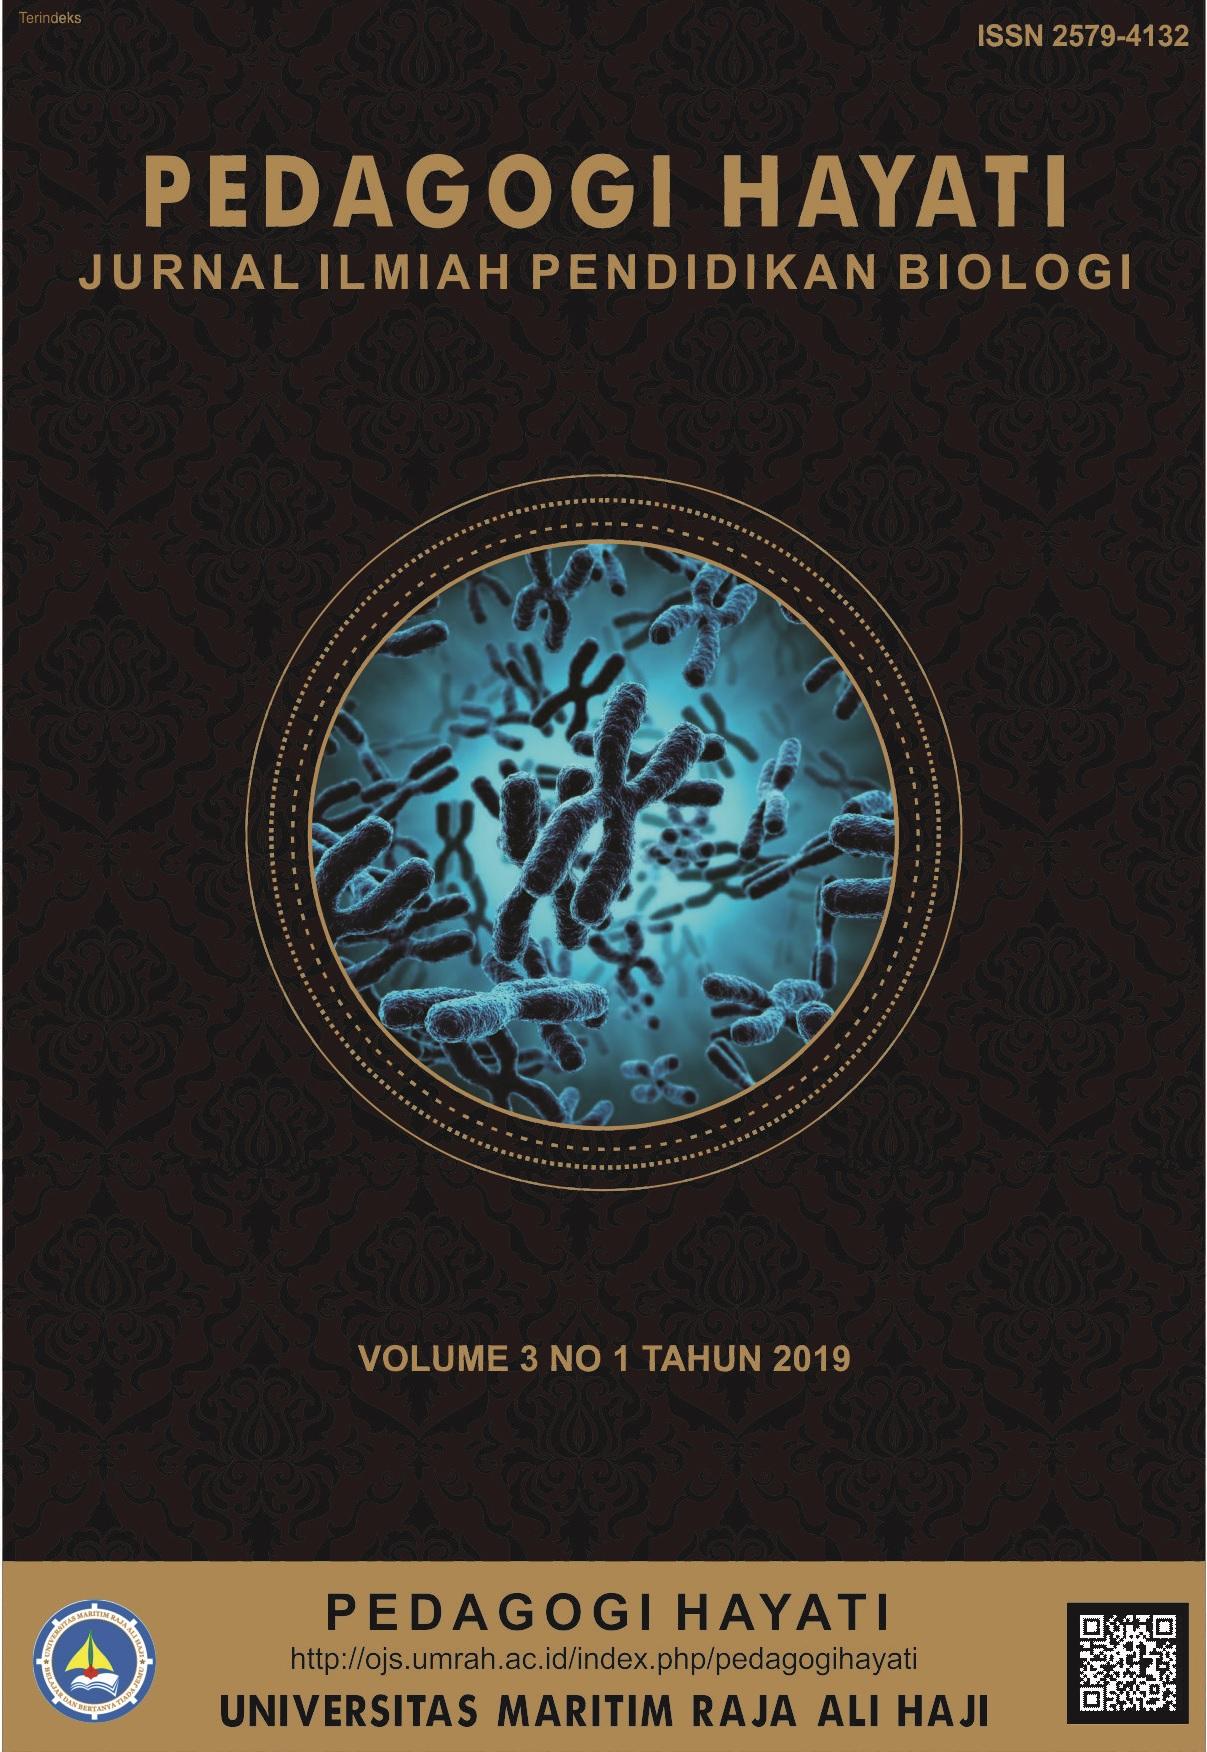 jurnal penelitian pendidikan biologi